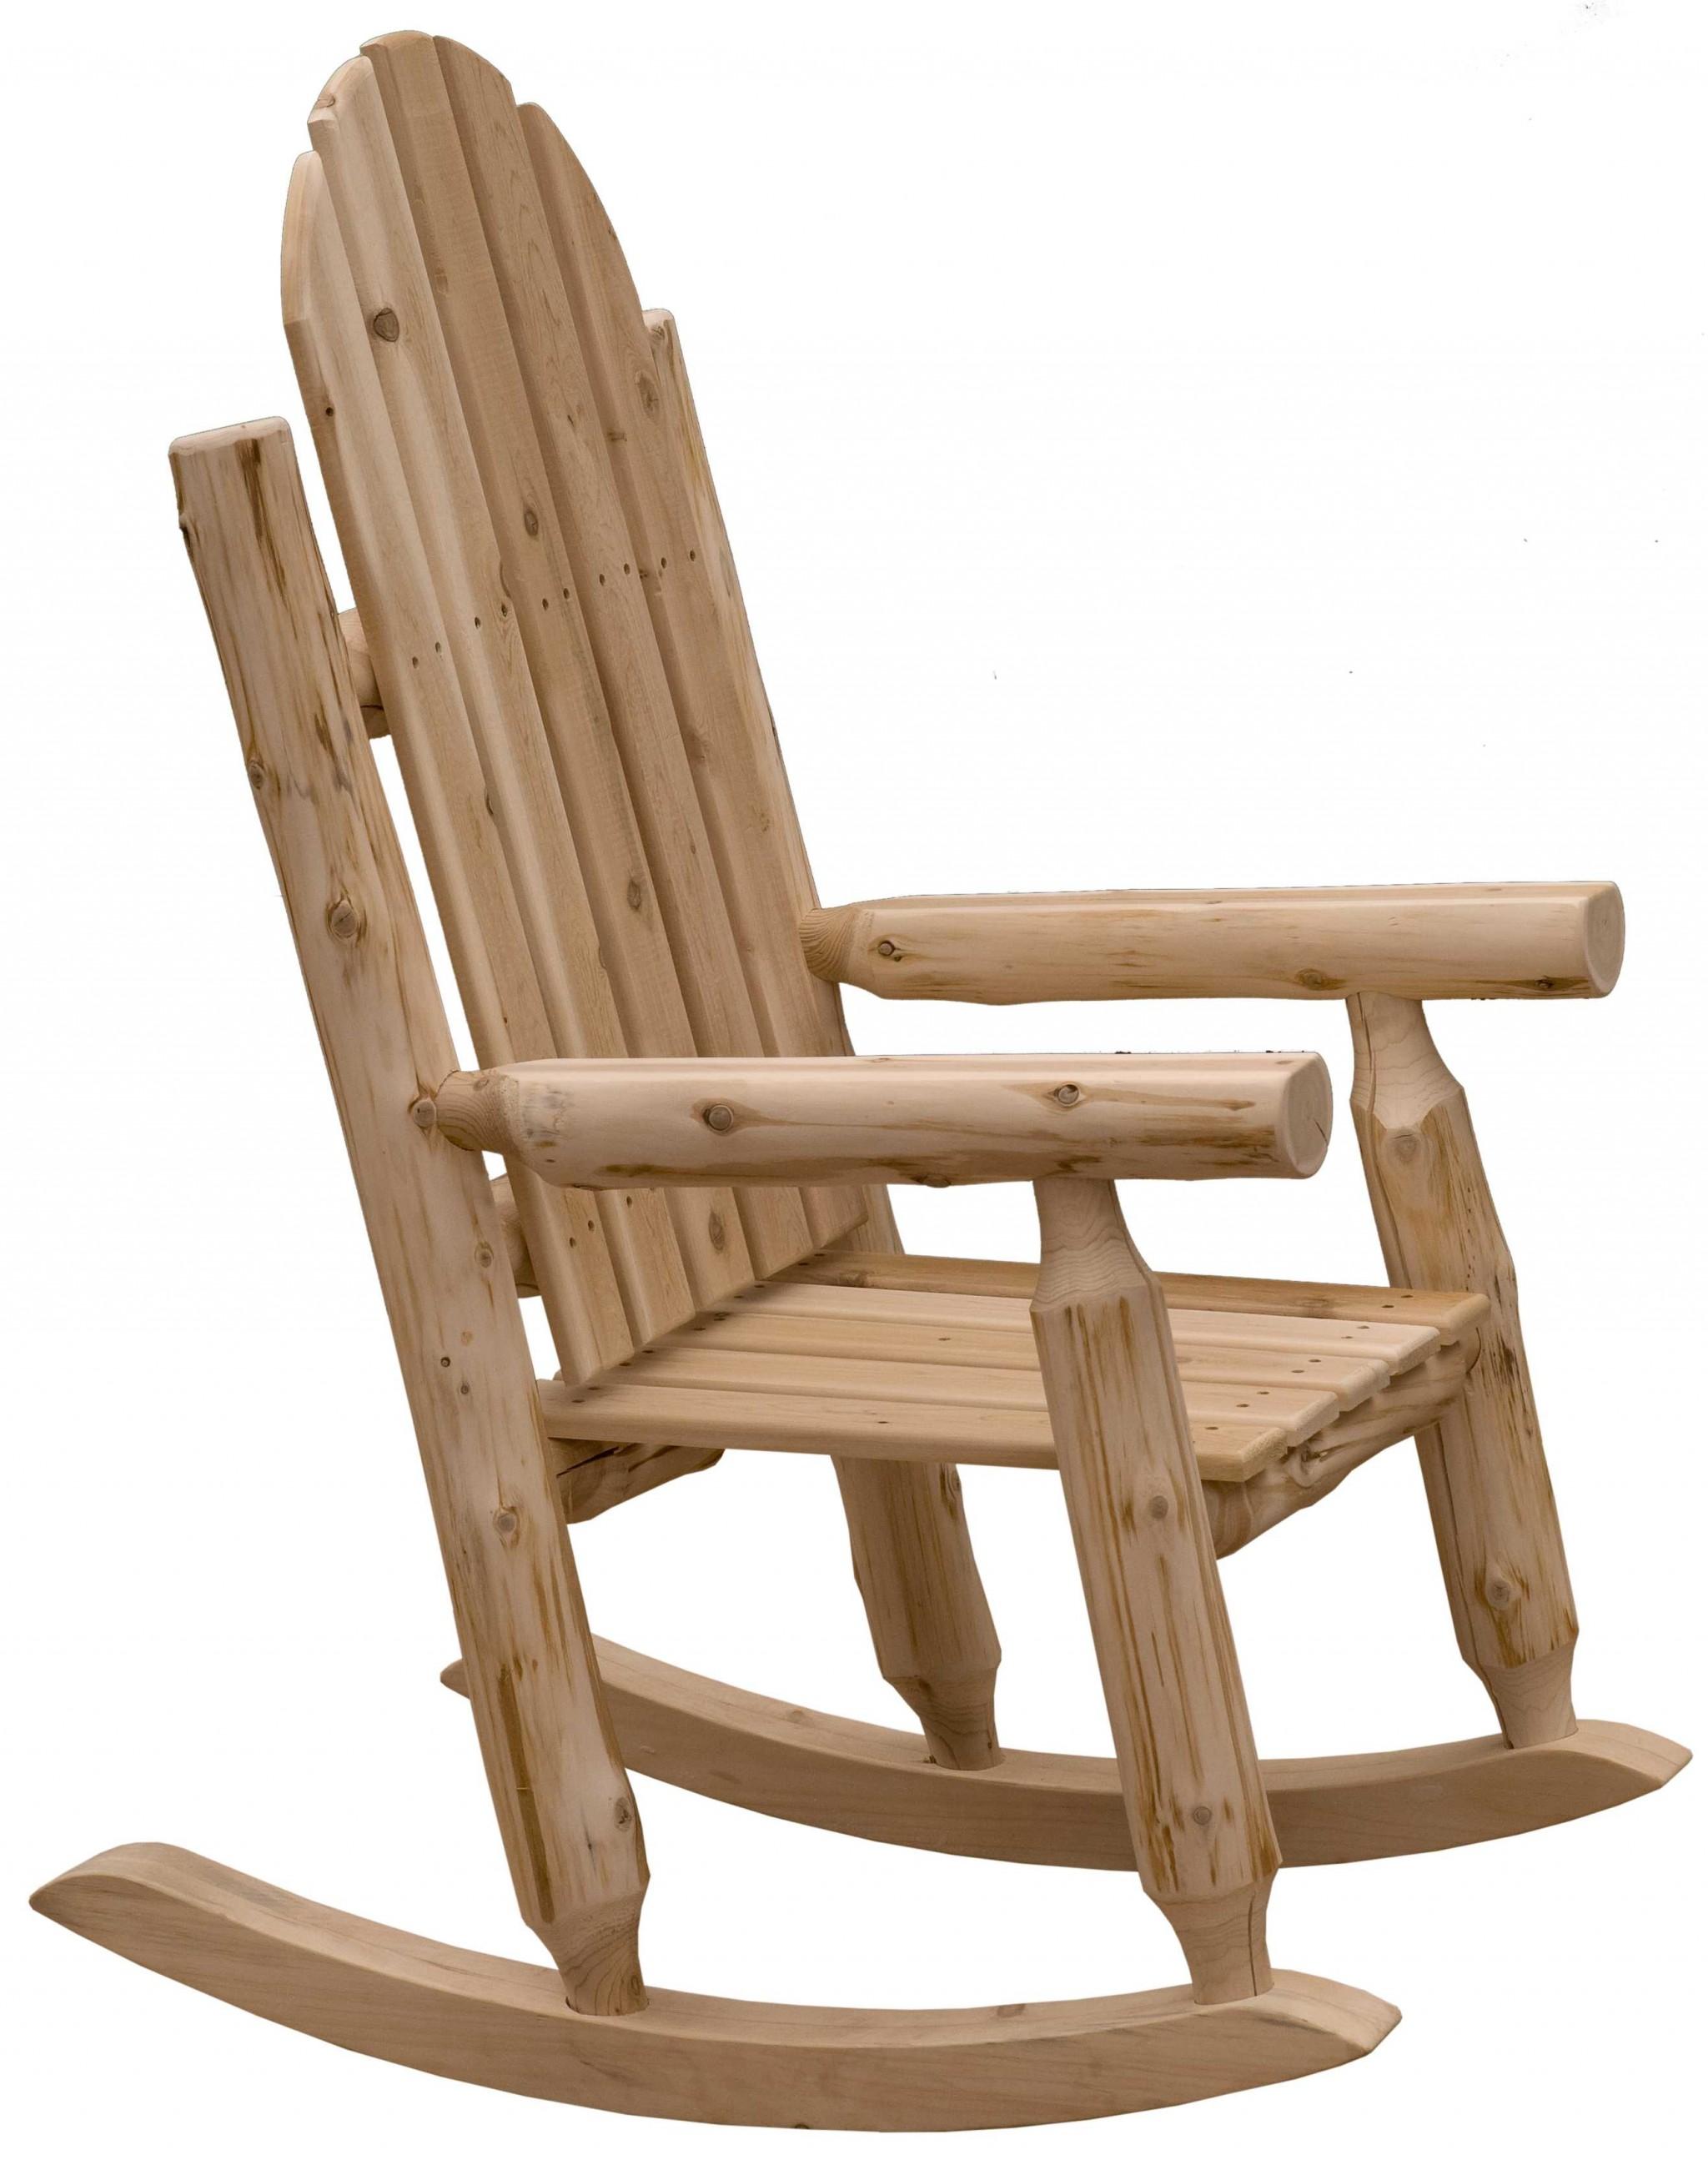 Rustic and Natural Cedar Adirondack Rocking Chair